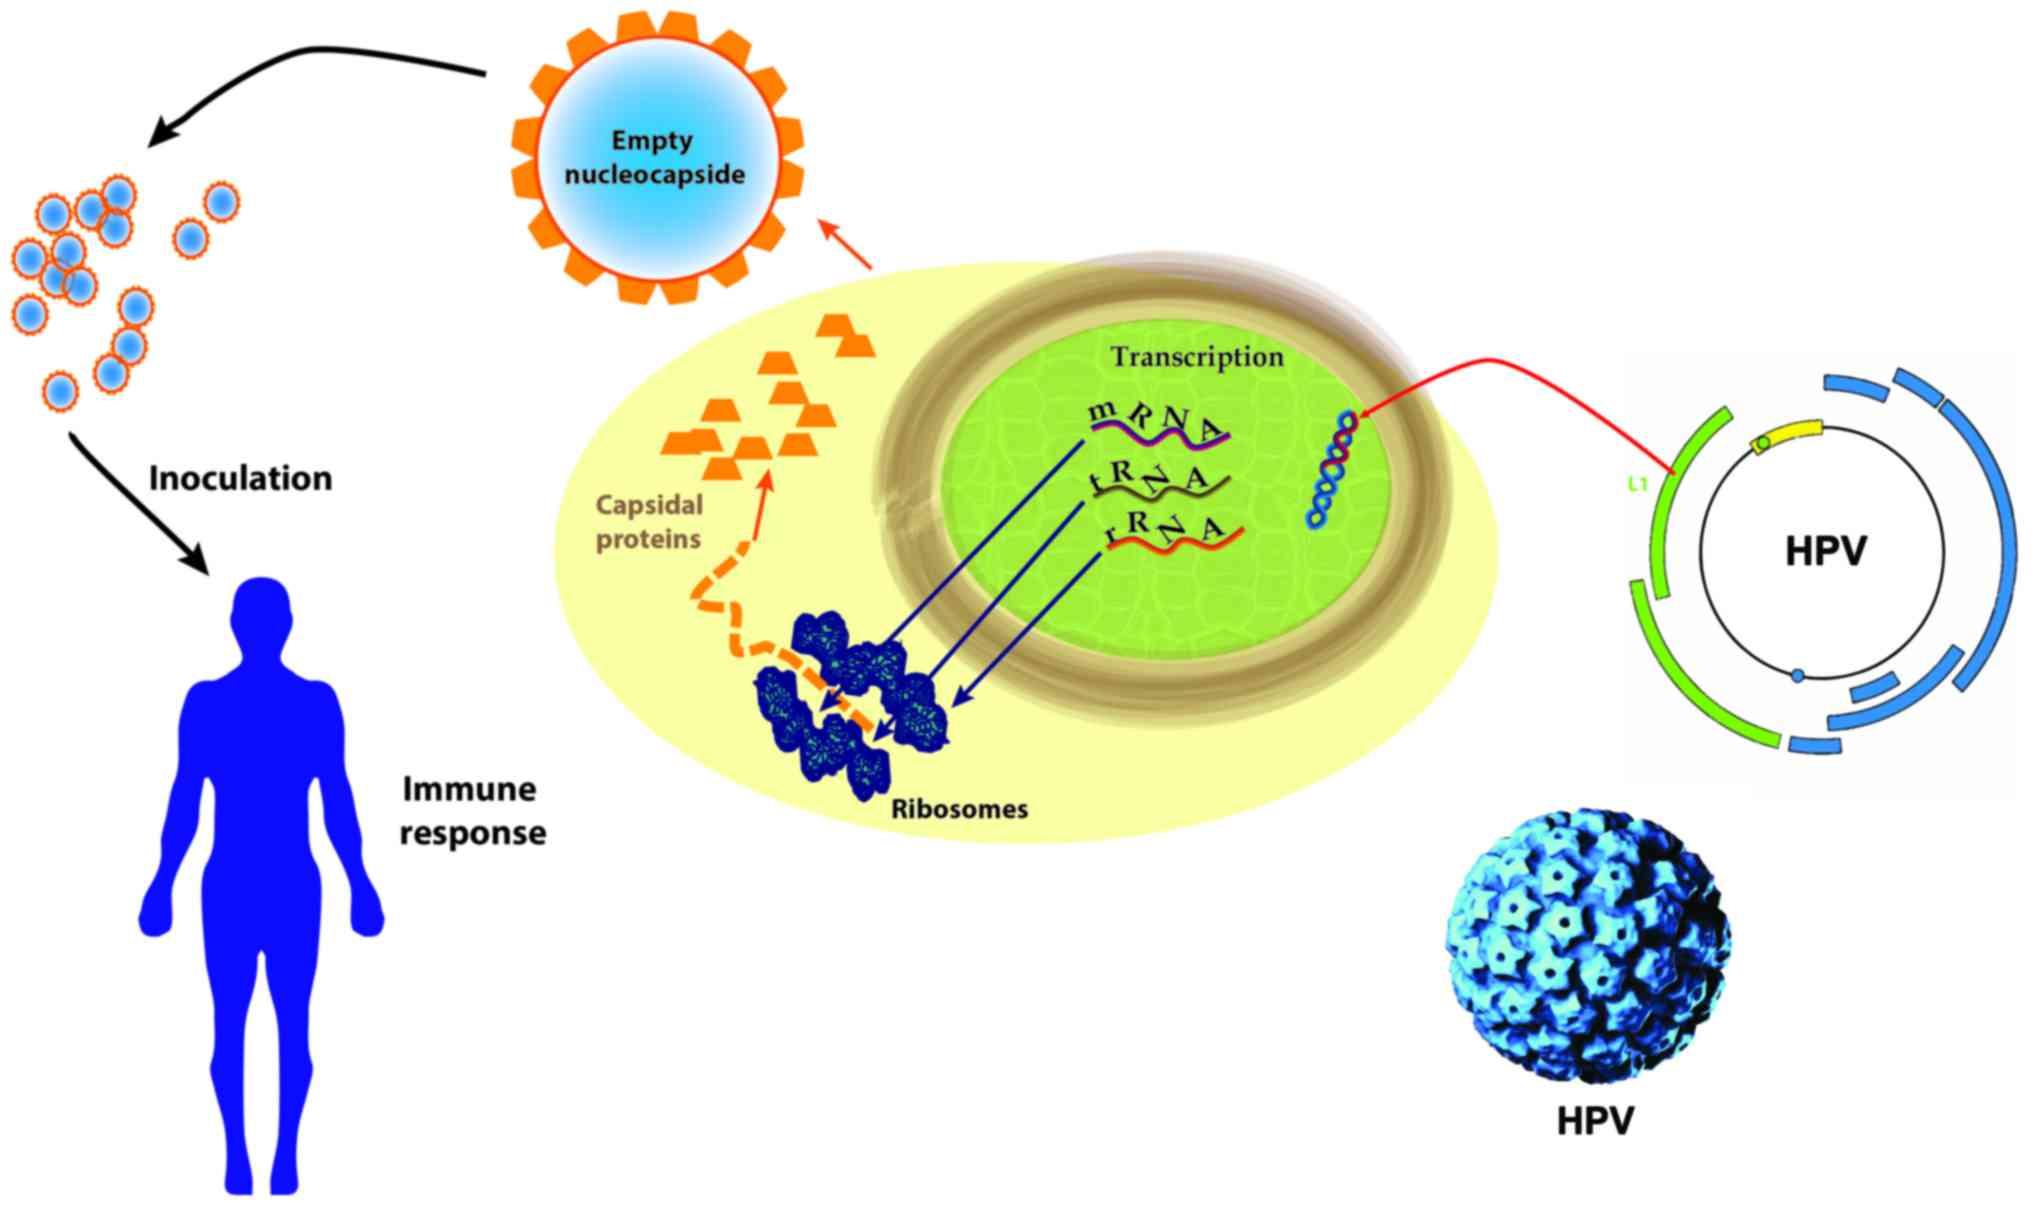 papillomavirus transmission routes